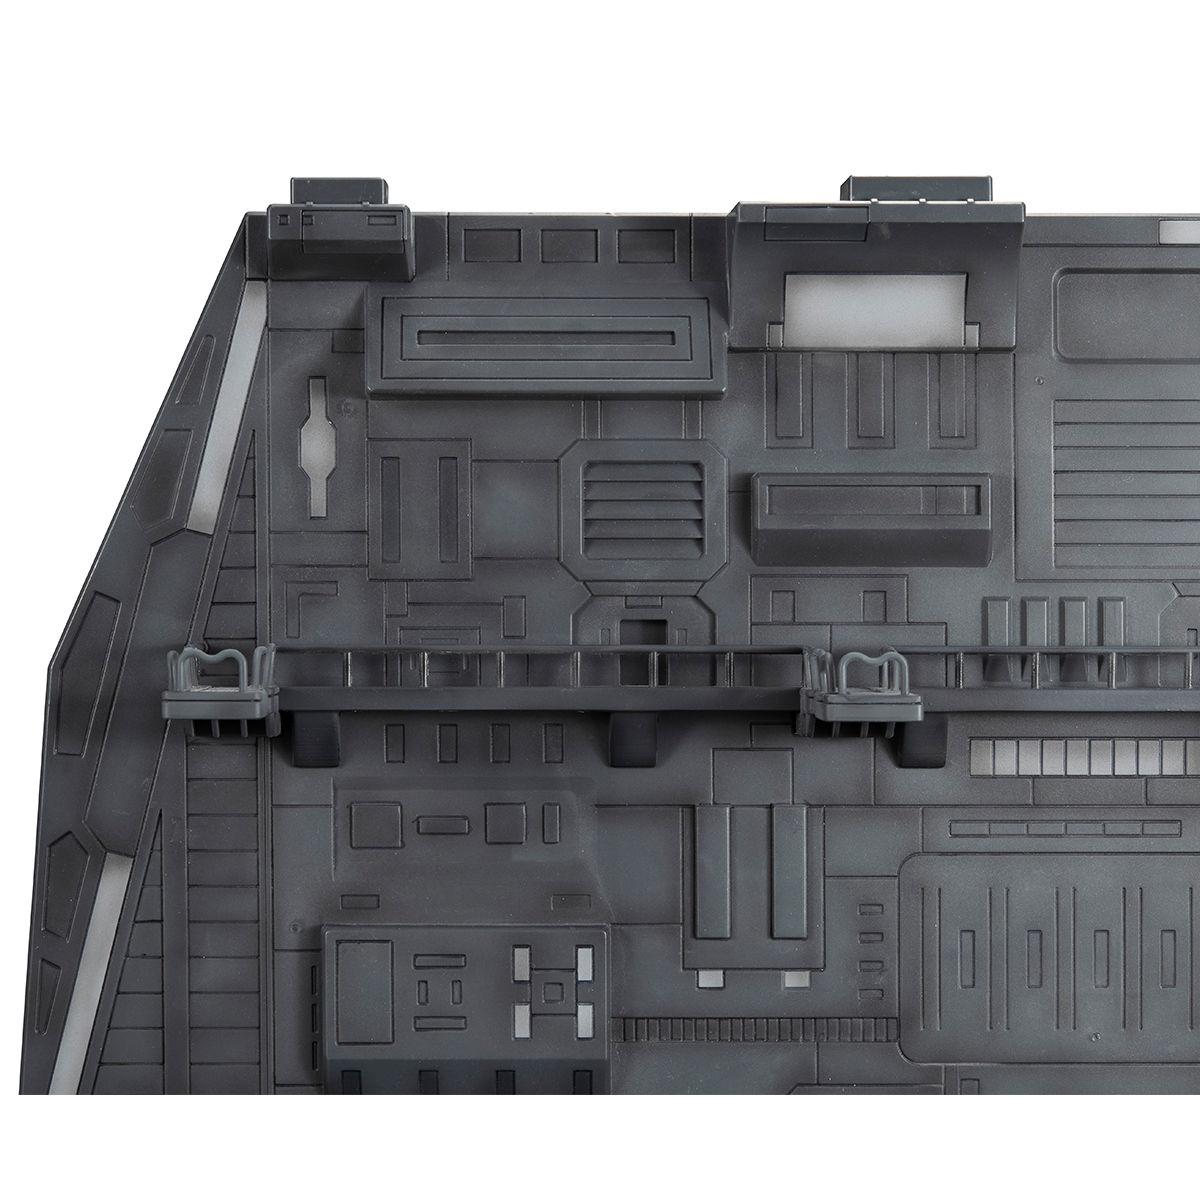 Realistic Model Series 1/144《機動戰士鋼彈》白色基地彈射甲板(ホワイトベースカタパルトデッキ) Renewal edition